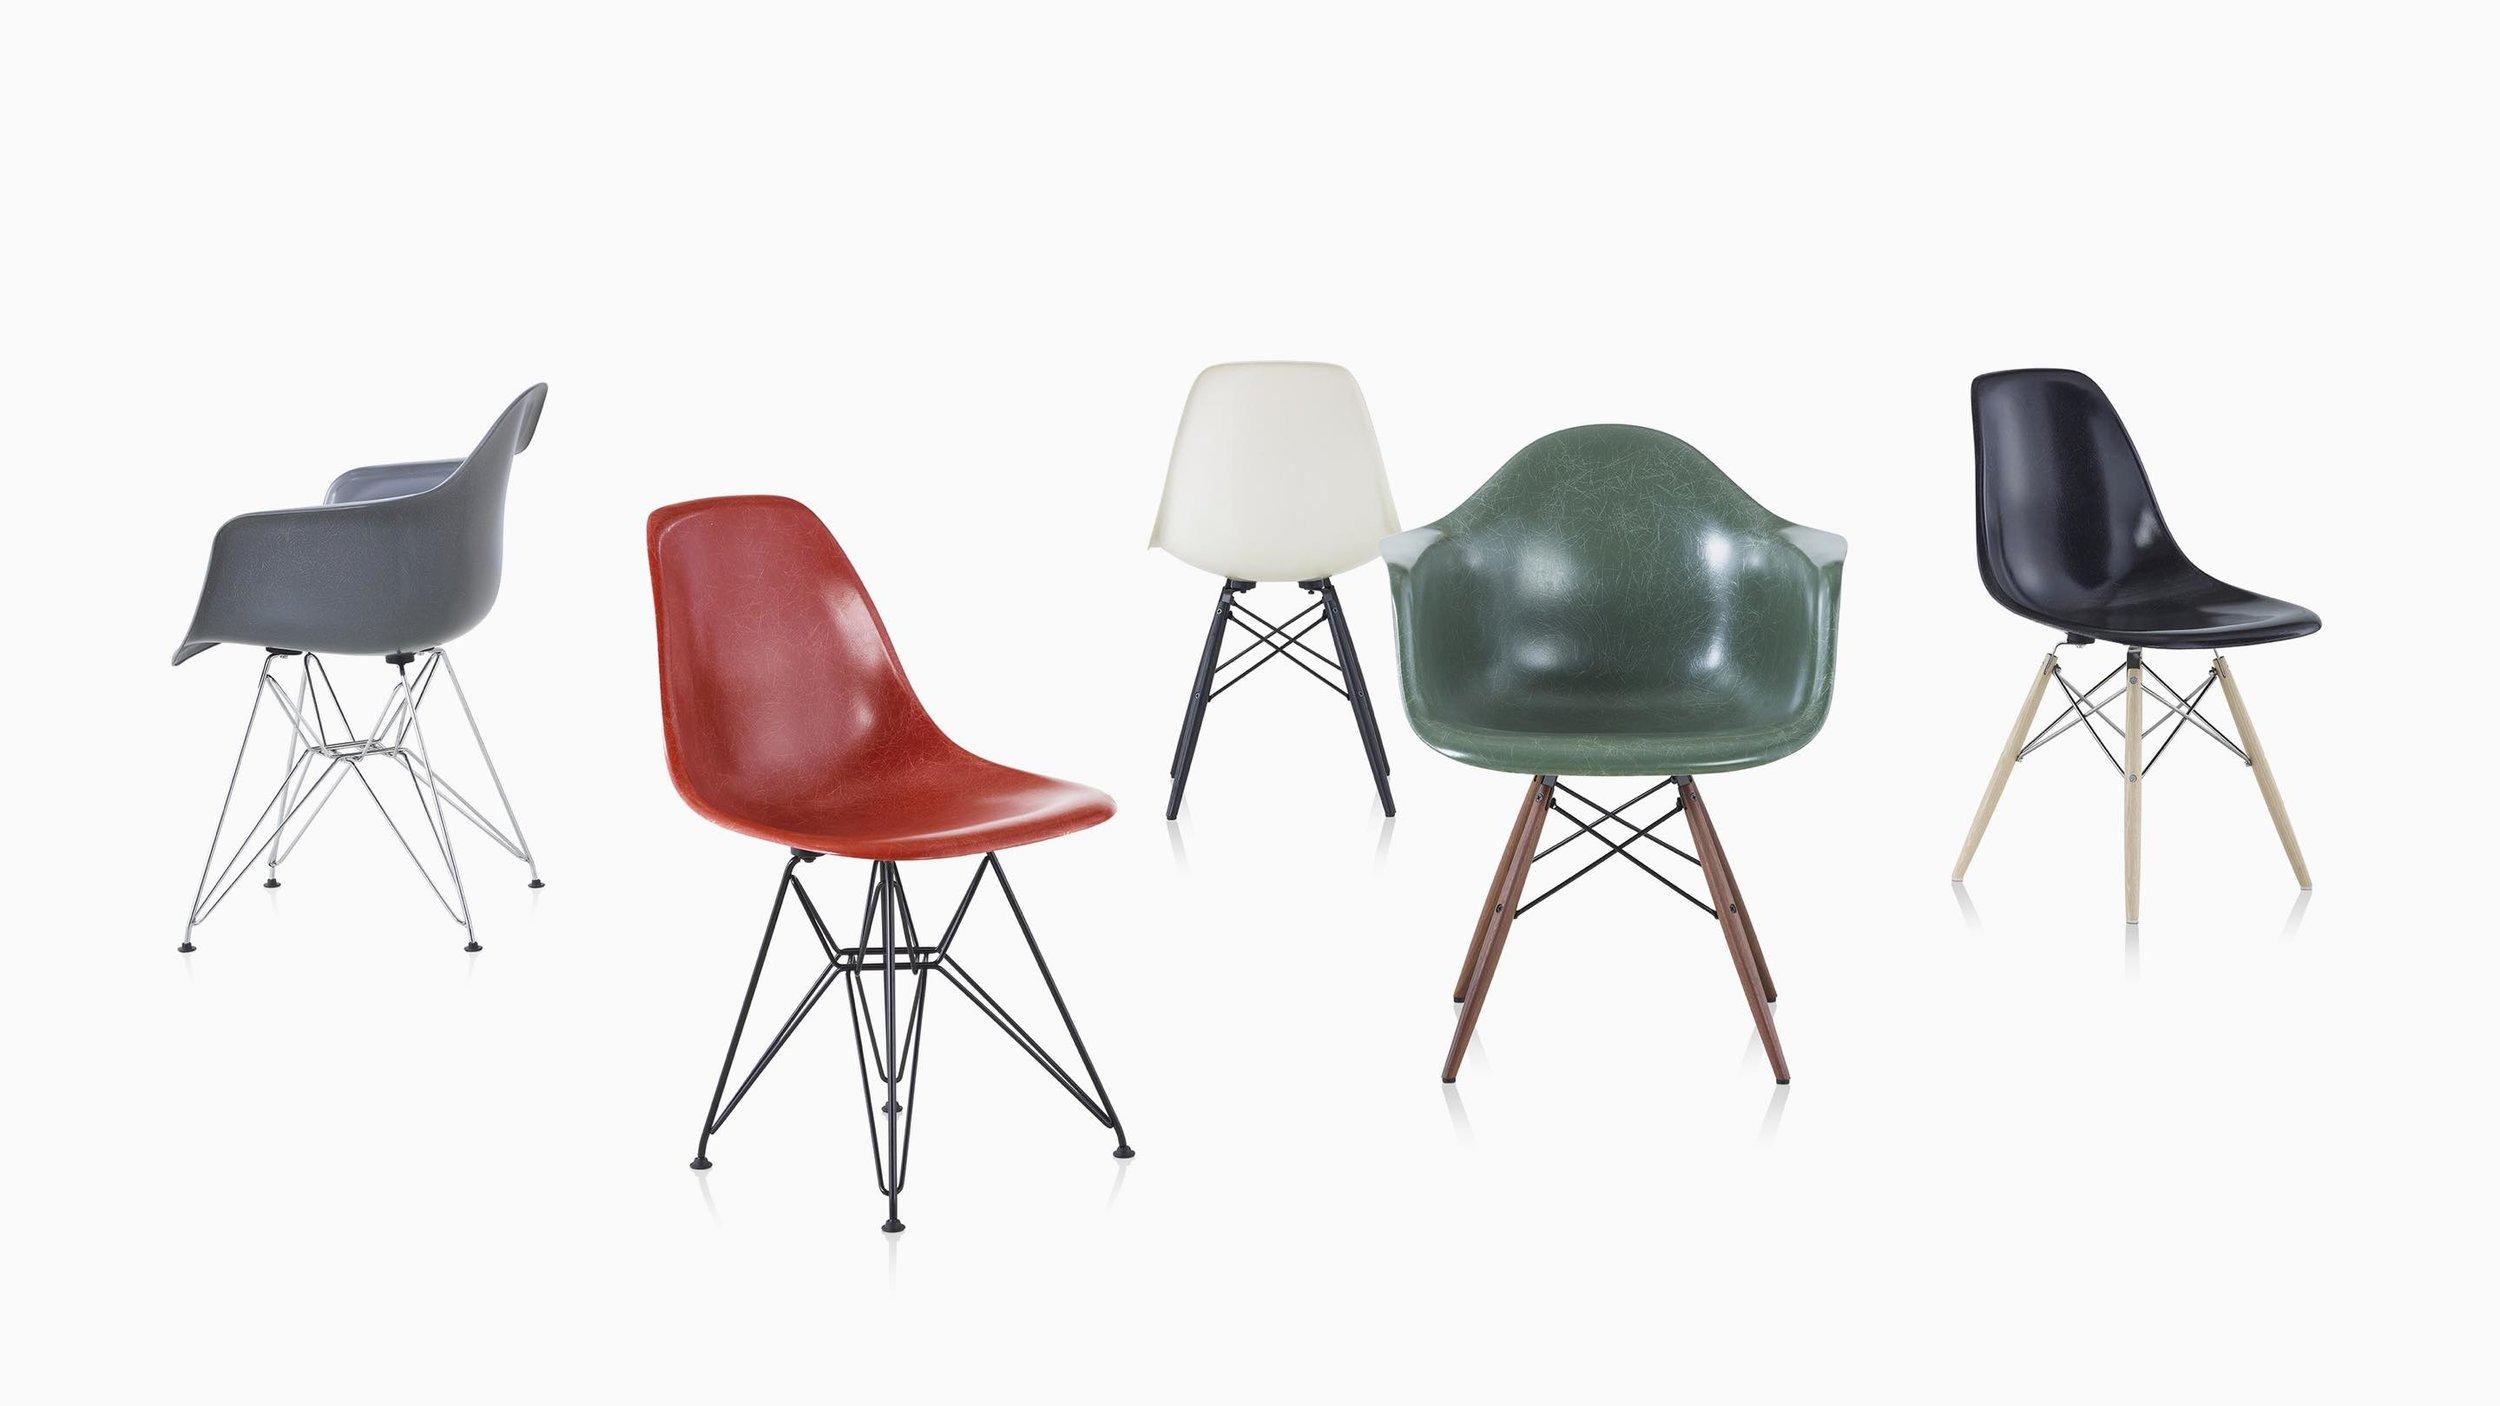 ig_prd_ovw_eames_molded_fiberglass_chairs_02.jpg